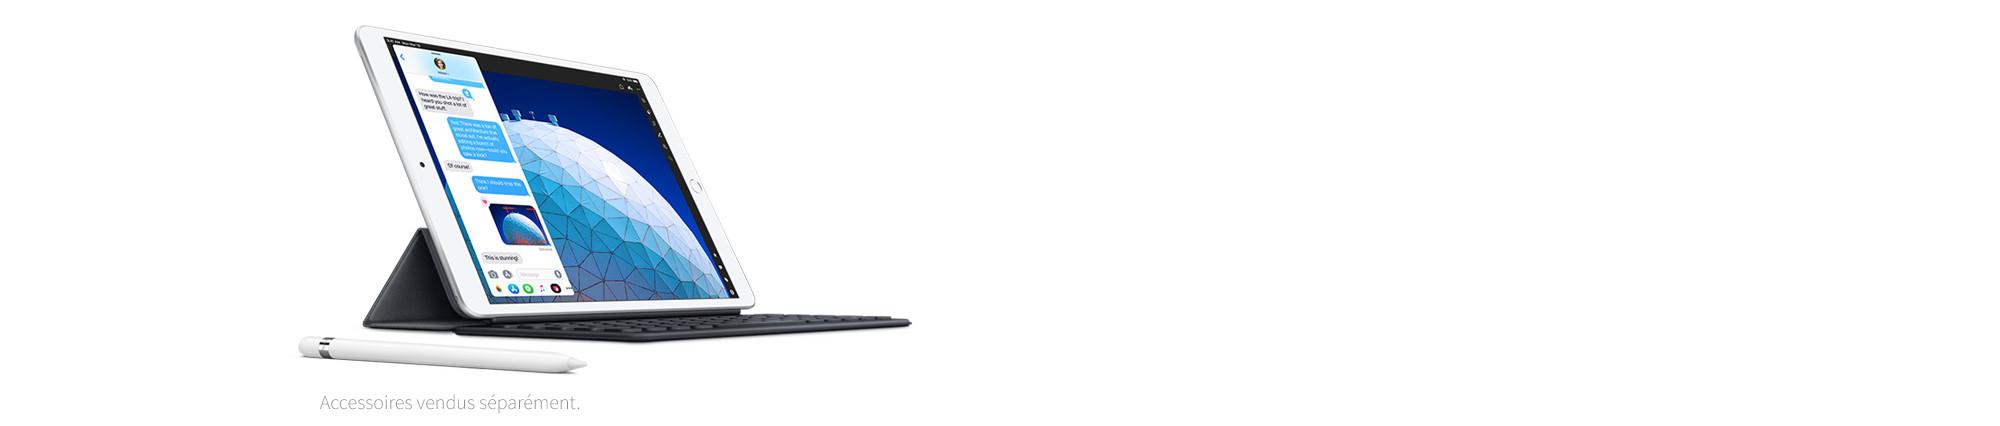 Slider-newiPadPro2019-fr.jpg